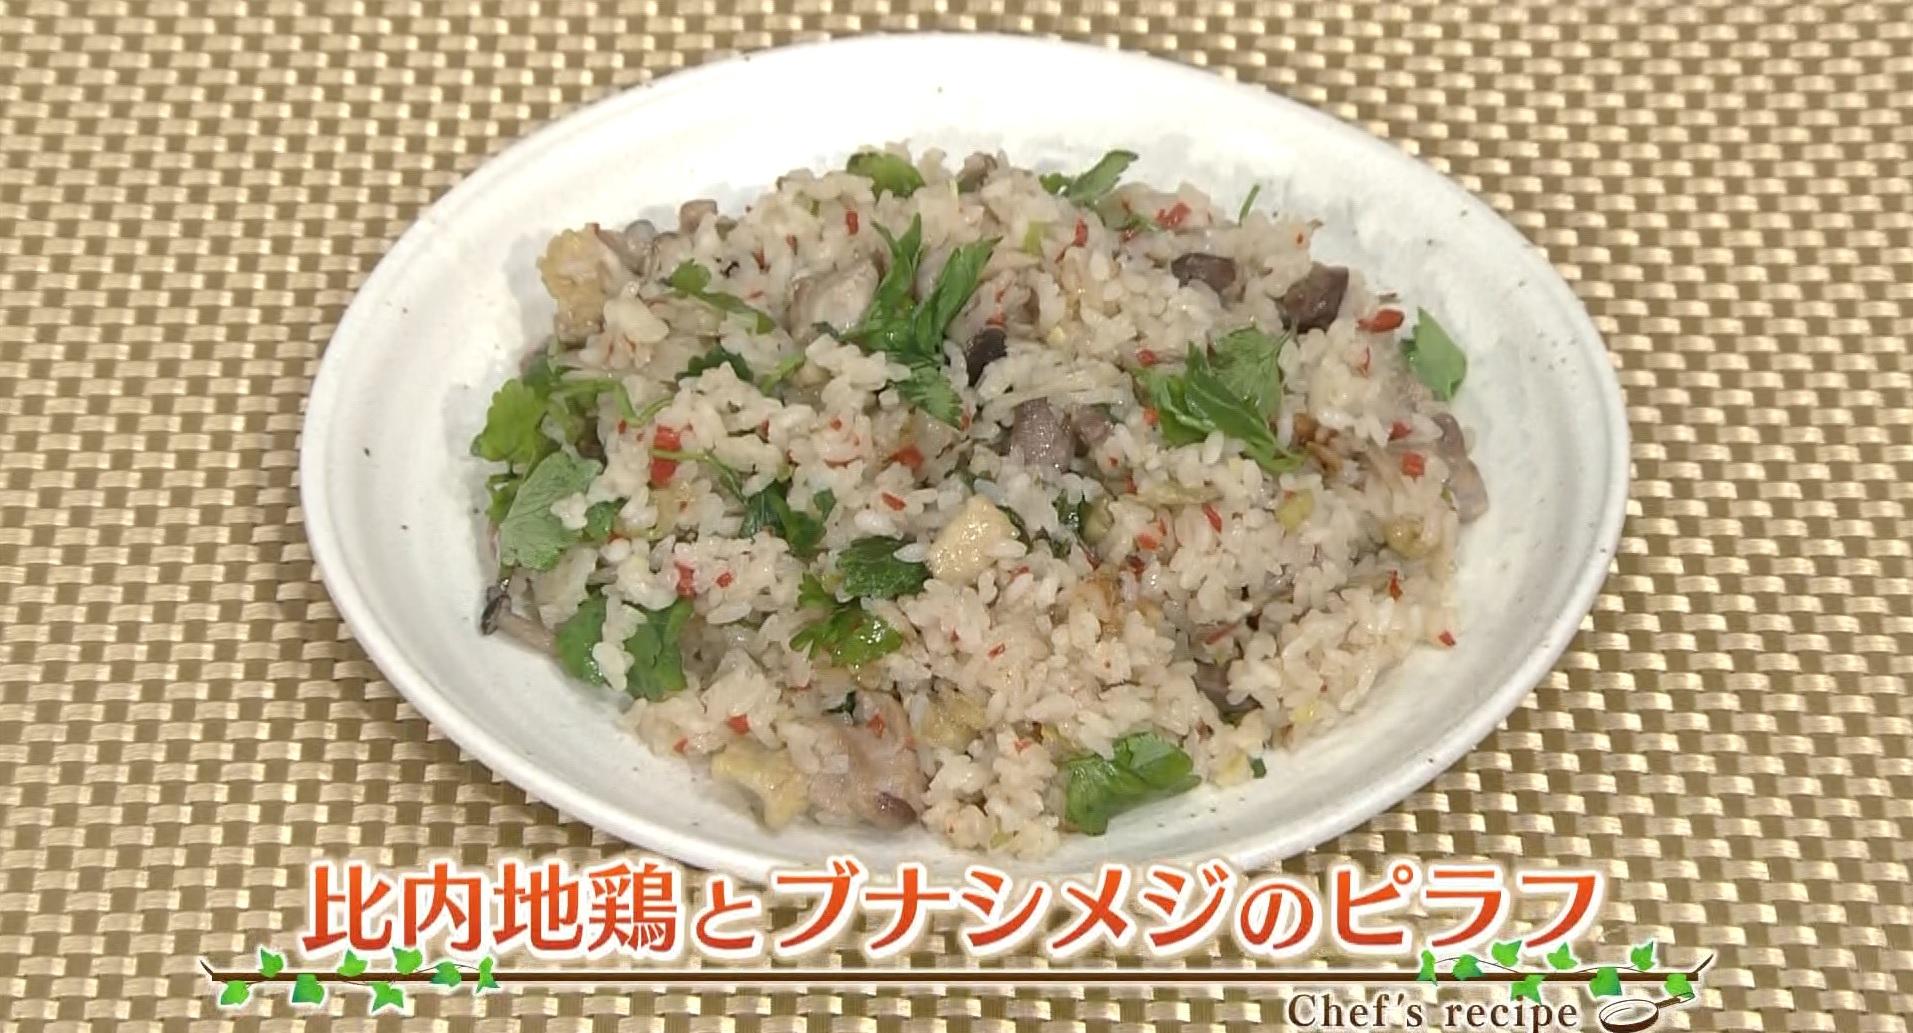 ABSえび☆ステ【シェフズレシピ】比内地鶏とブナシメジのピラフ by岸紀雄